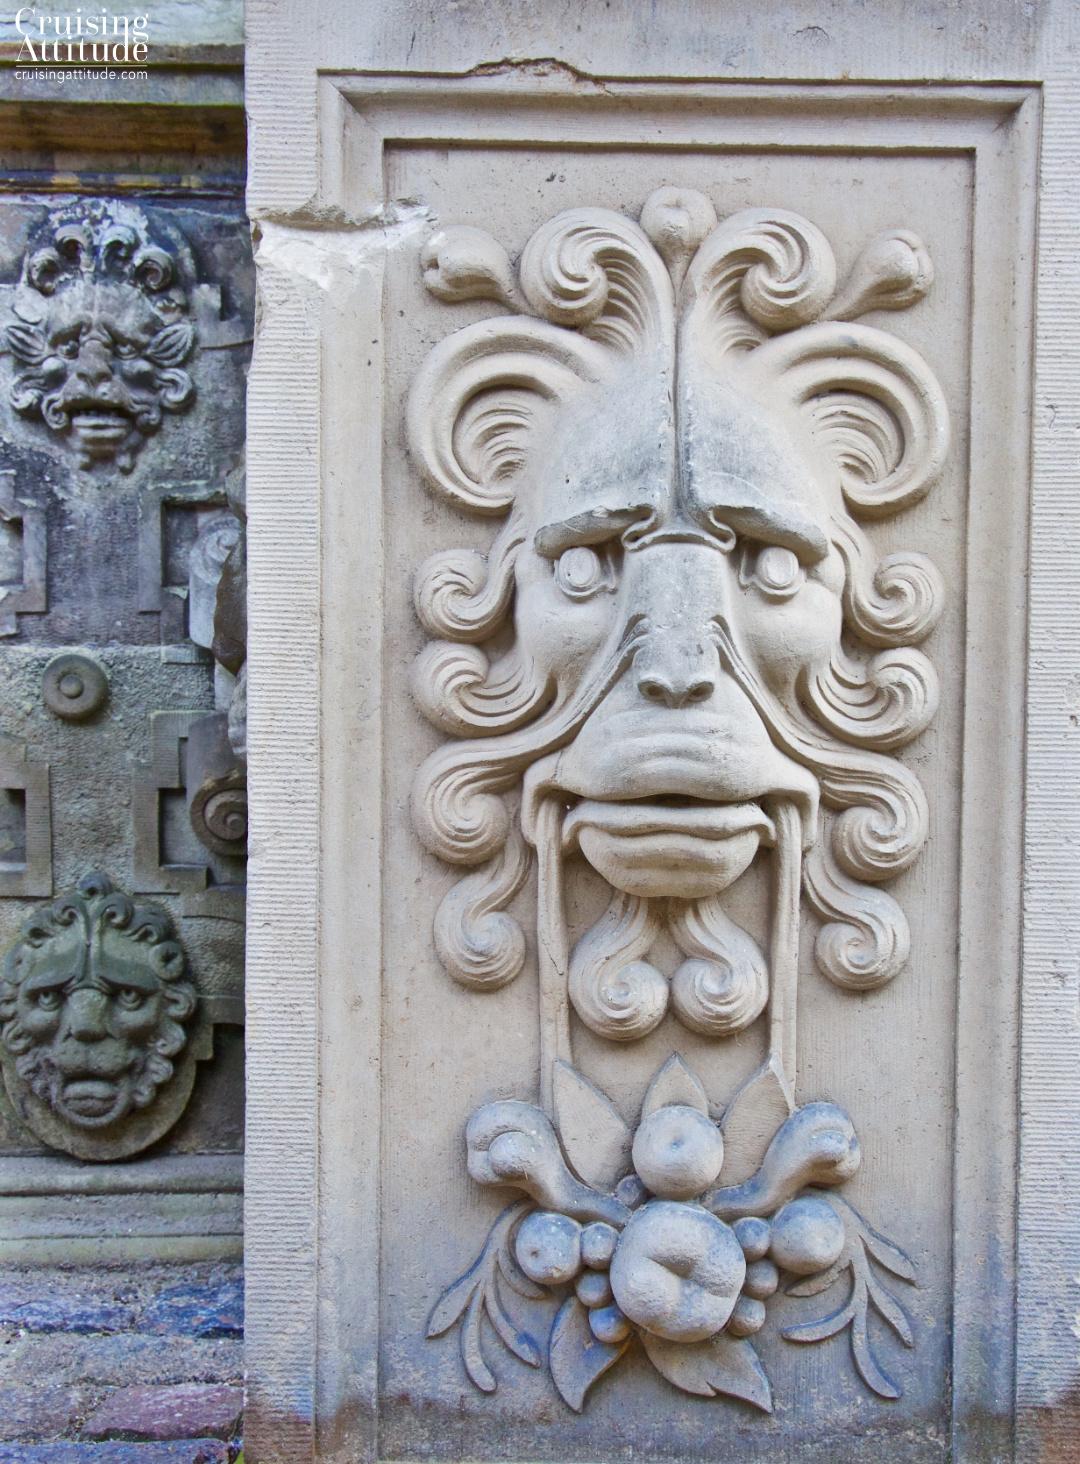 Sculpture at Kronberg Castle in Helsingør, Denmark | Cruising Attitude Sailing Blog - Discovery 55